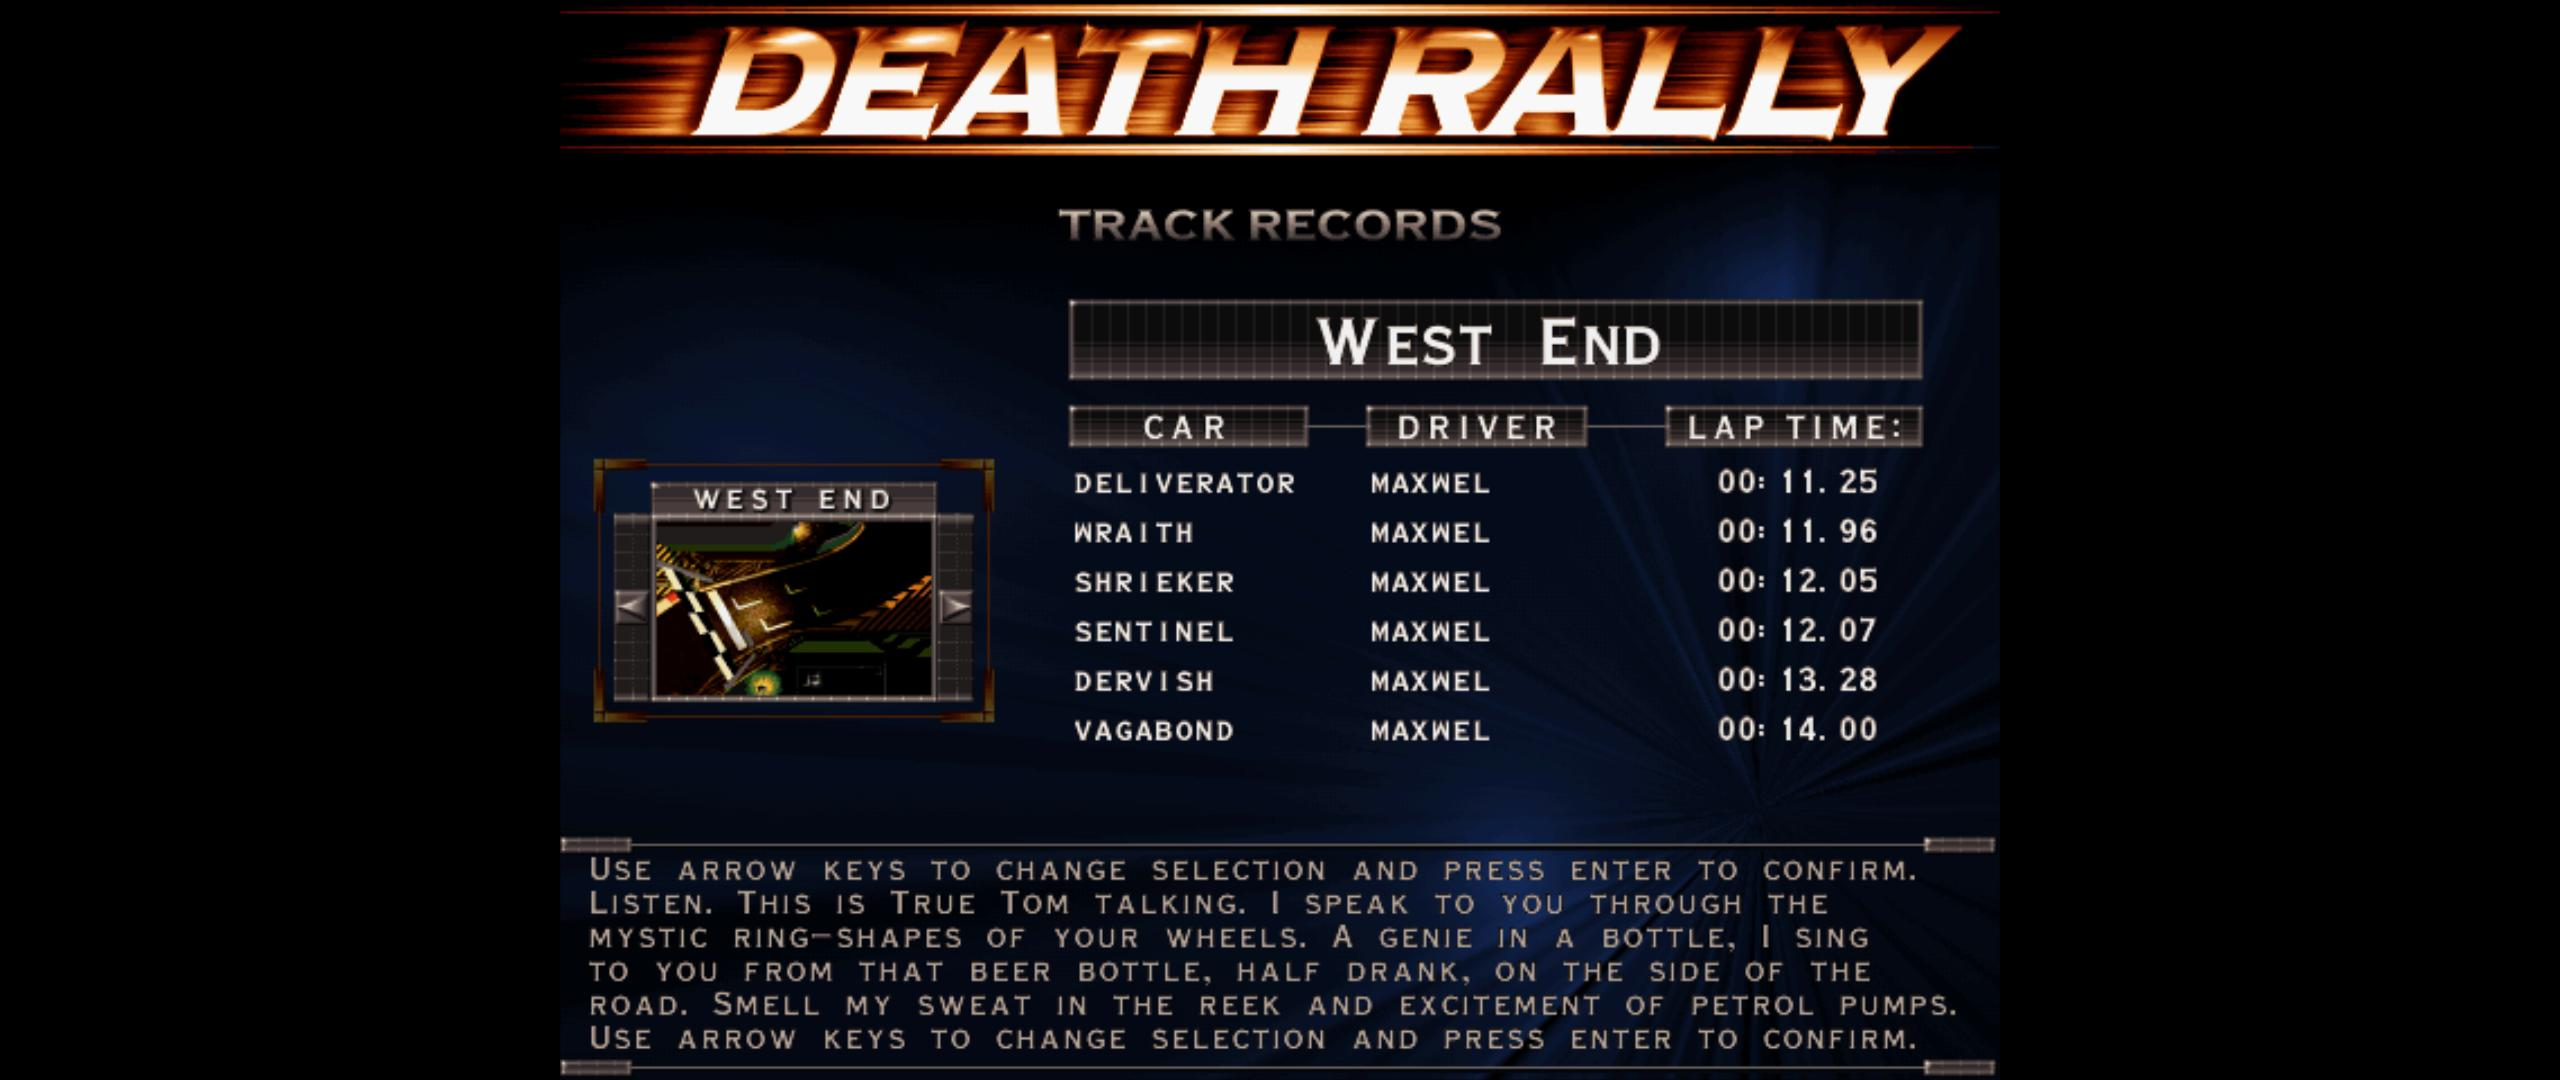 Maxwel: Death Rally [West End, Shrieker Car] (PC) 0:00:12.05 points on 2016-03-04 05:39:07